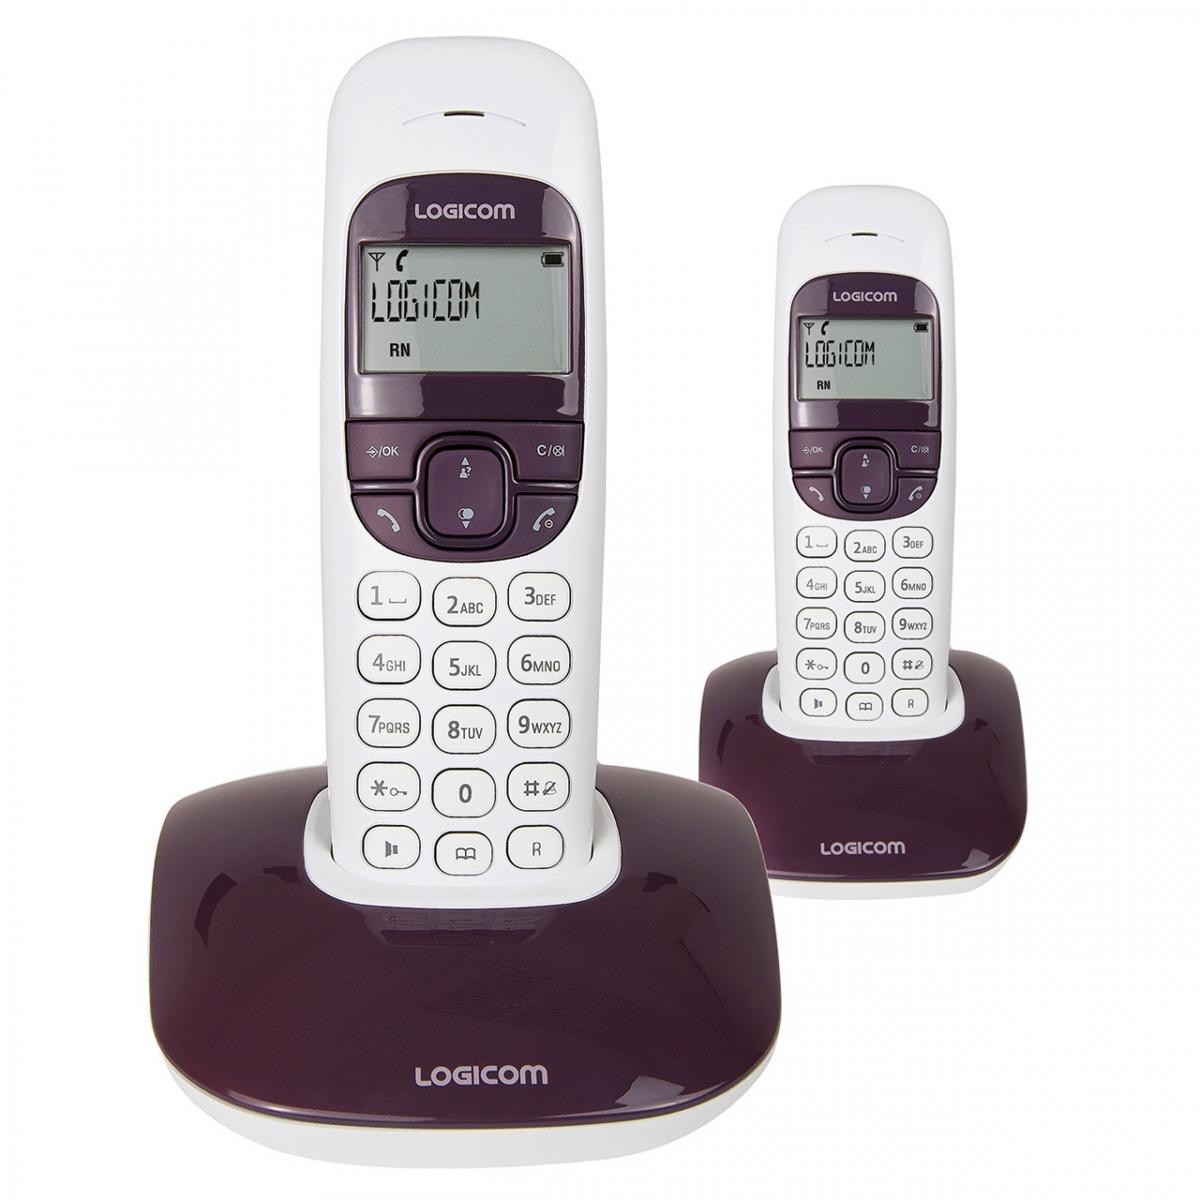 t l phone dect main libre soly 250 duo produits t l phonie r sidentielle logicom. Black Bedroom Furniture Sets. Home Design Ideas